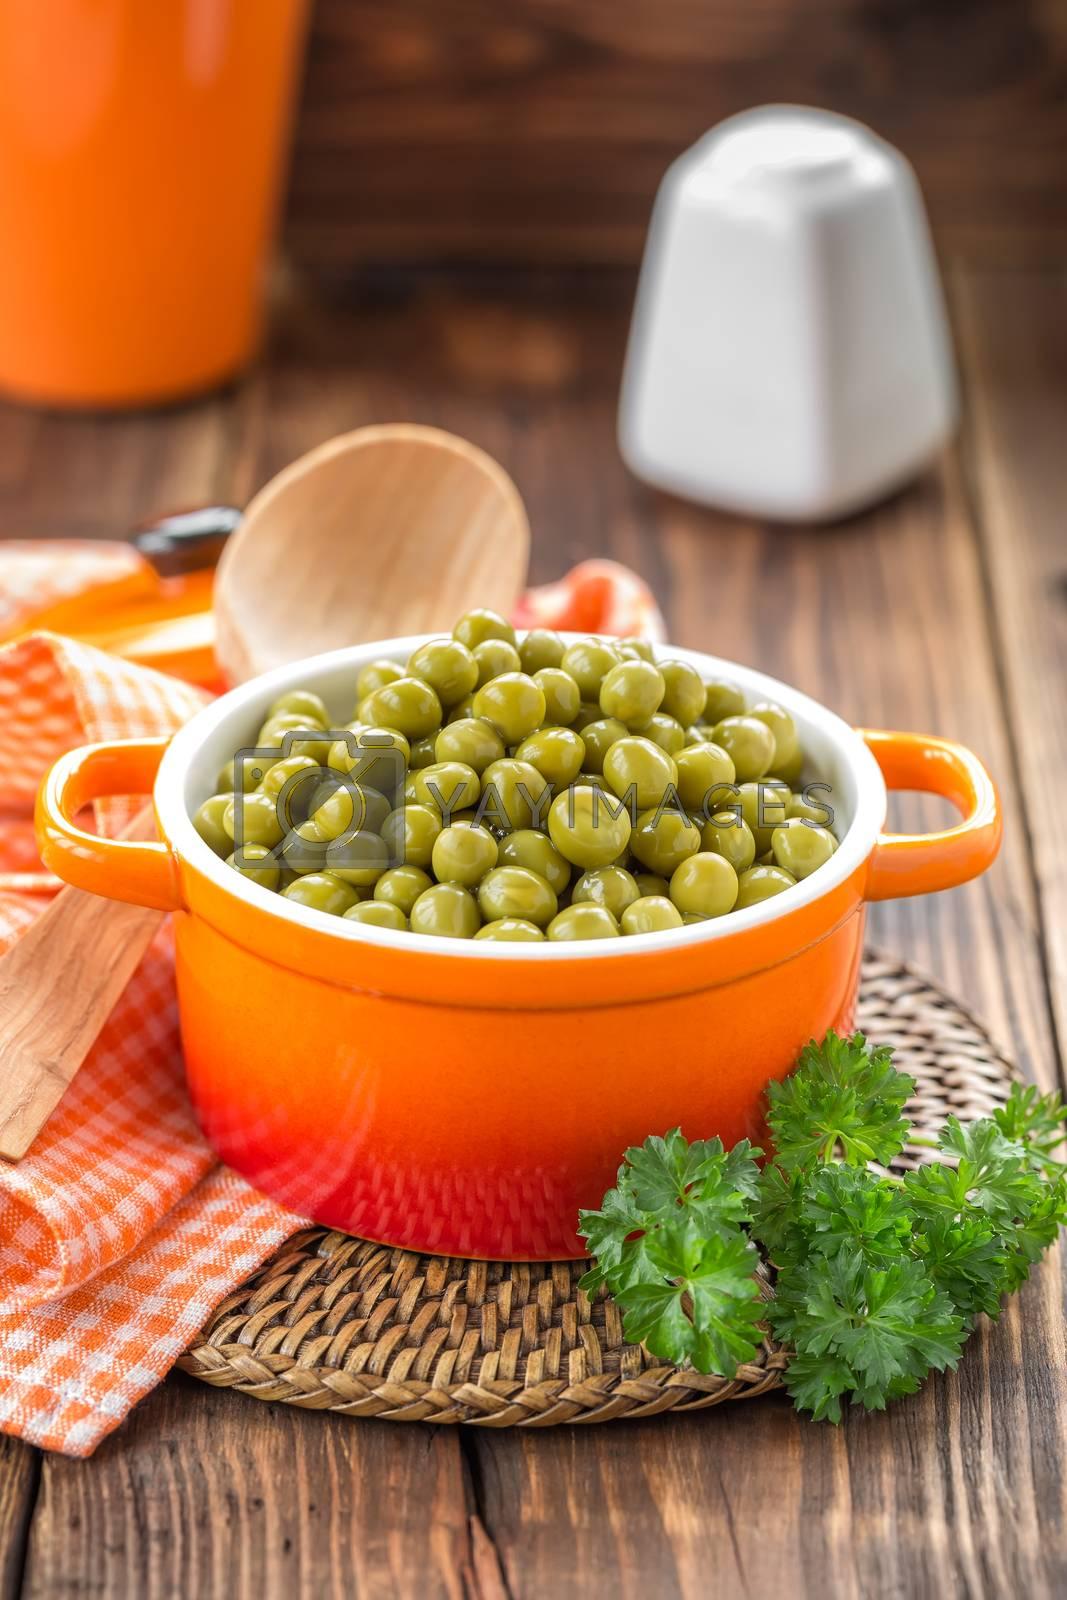 Royalty free image of Canned peas by yelenayemchuk